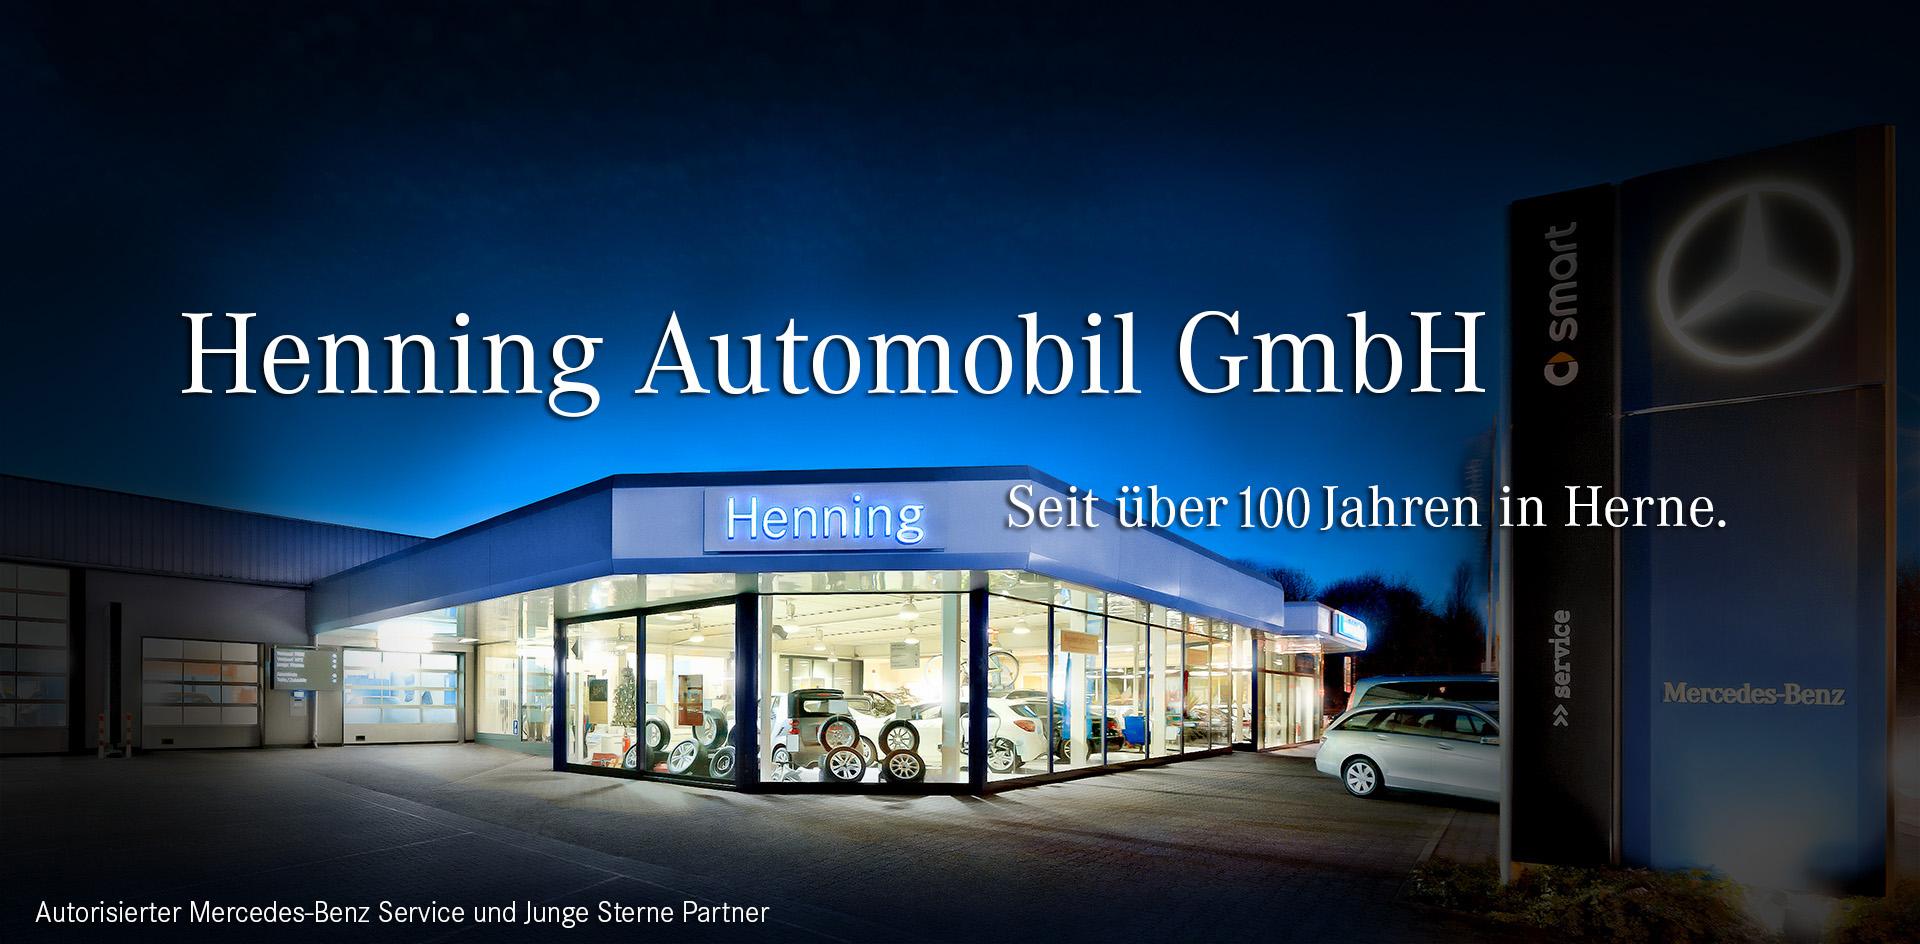 Henning_Automobile_Autohaus_100jahre-1